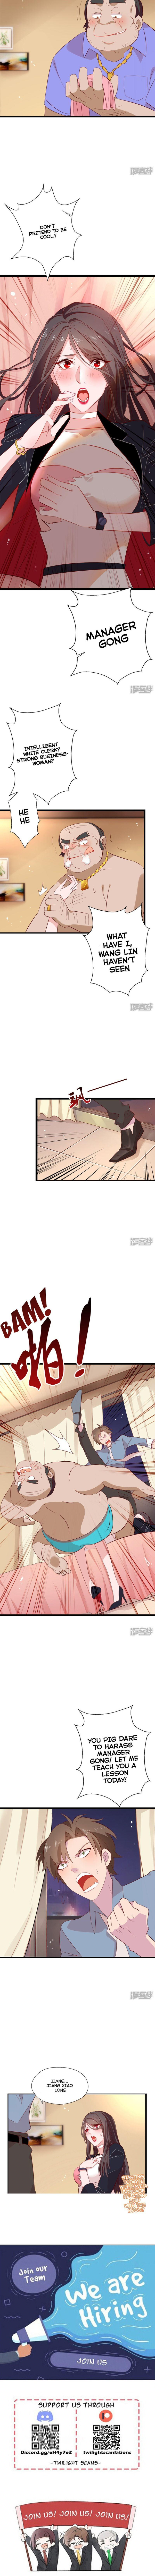 Spicy Female Boss Chapter 4 page 5 - Mangakakalots.com